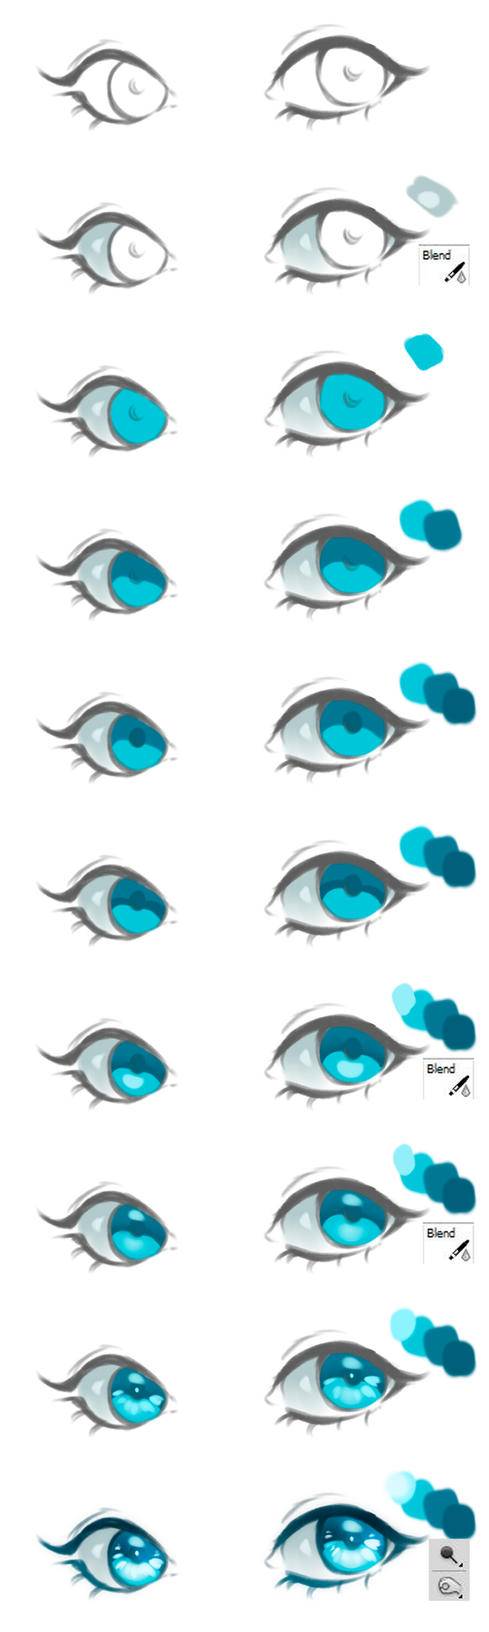 Anime Eyes Coloring Tutorial vol.2 by HaloBlaBla